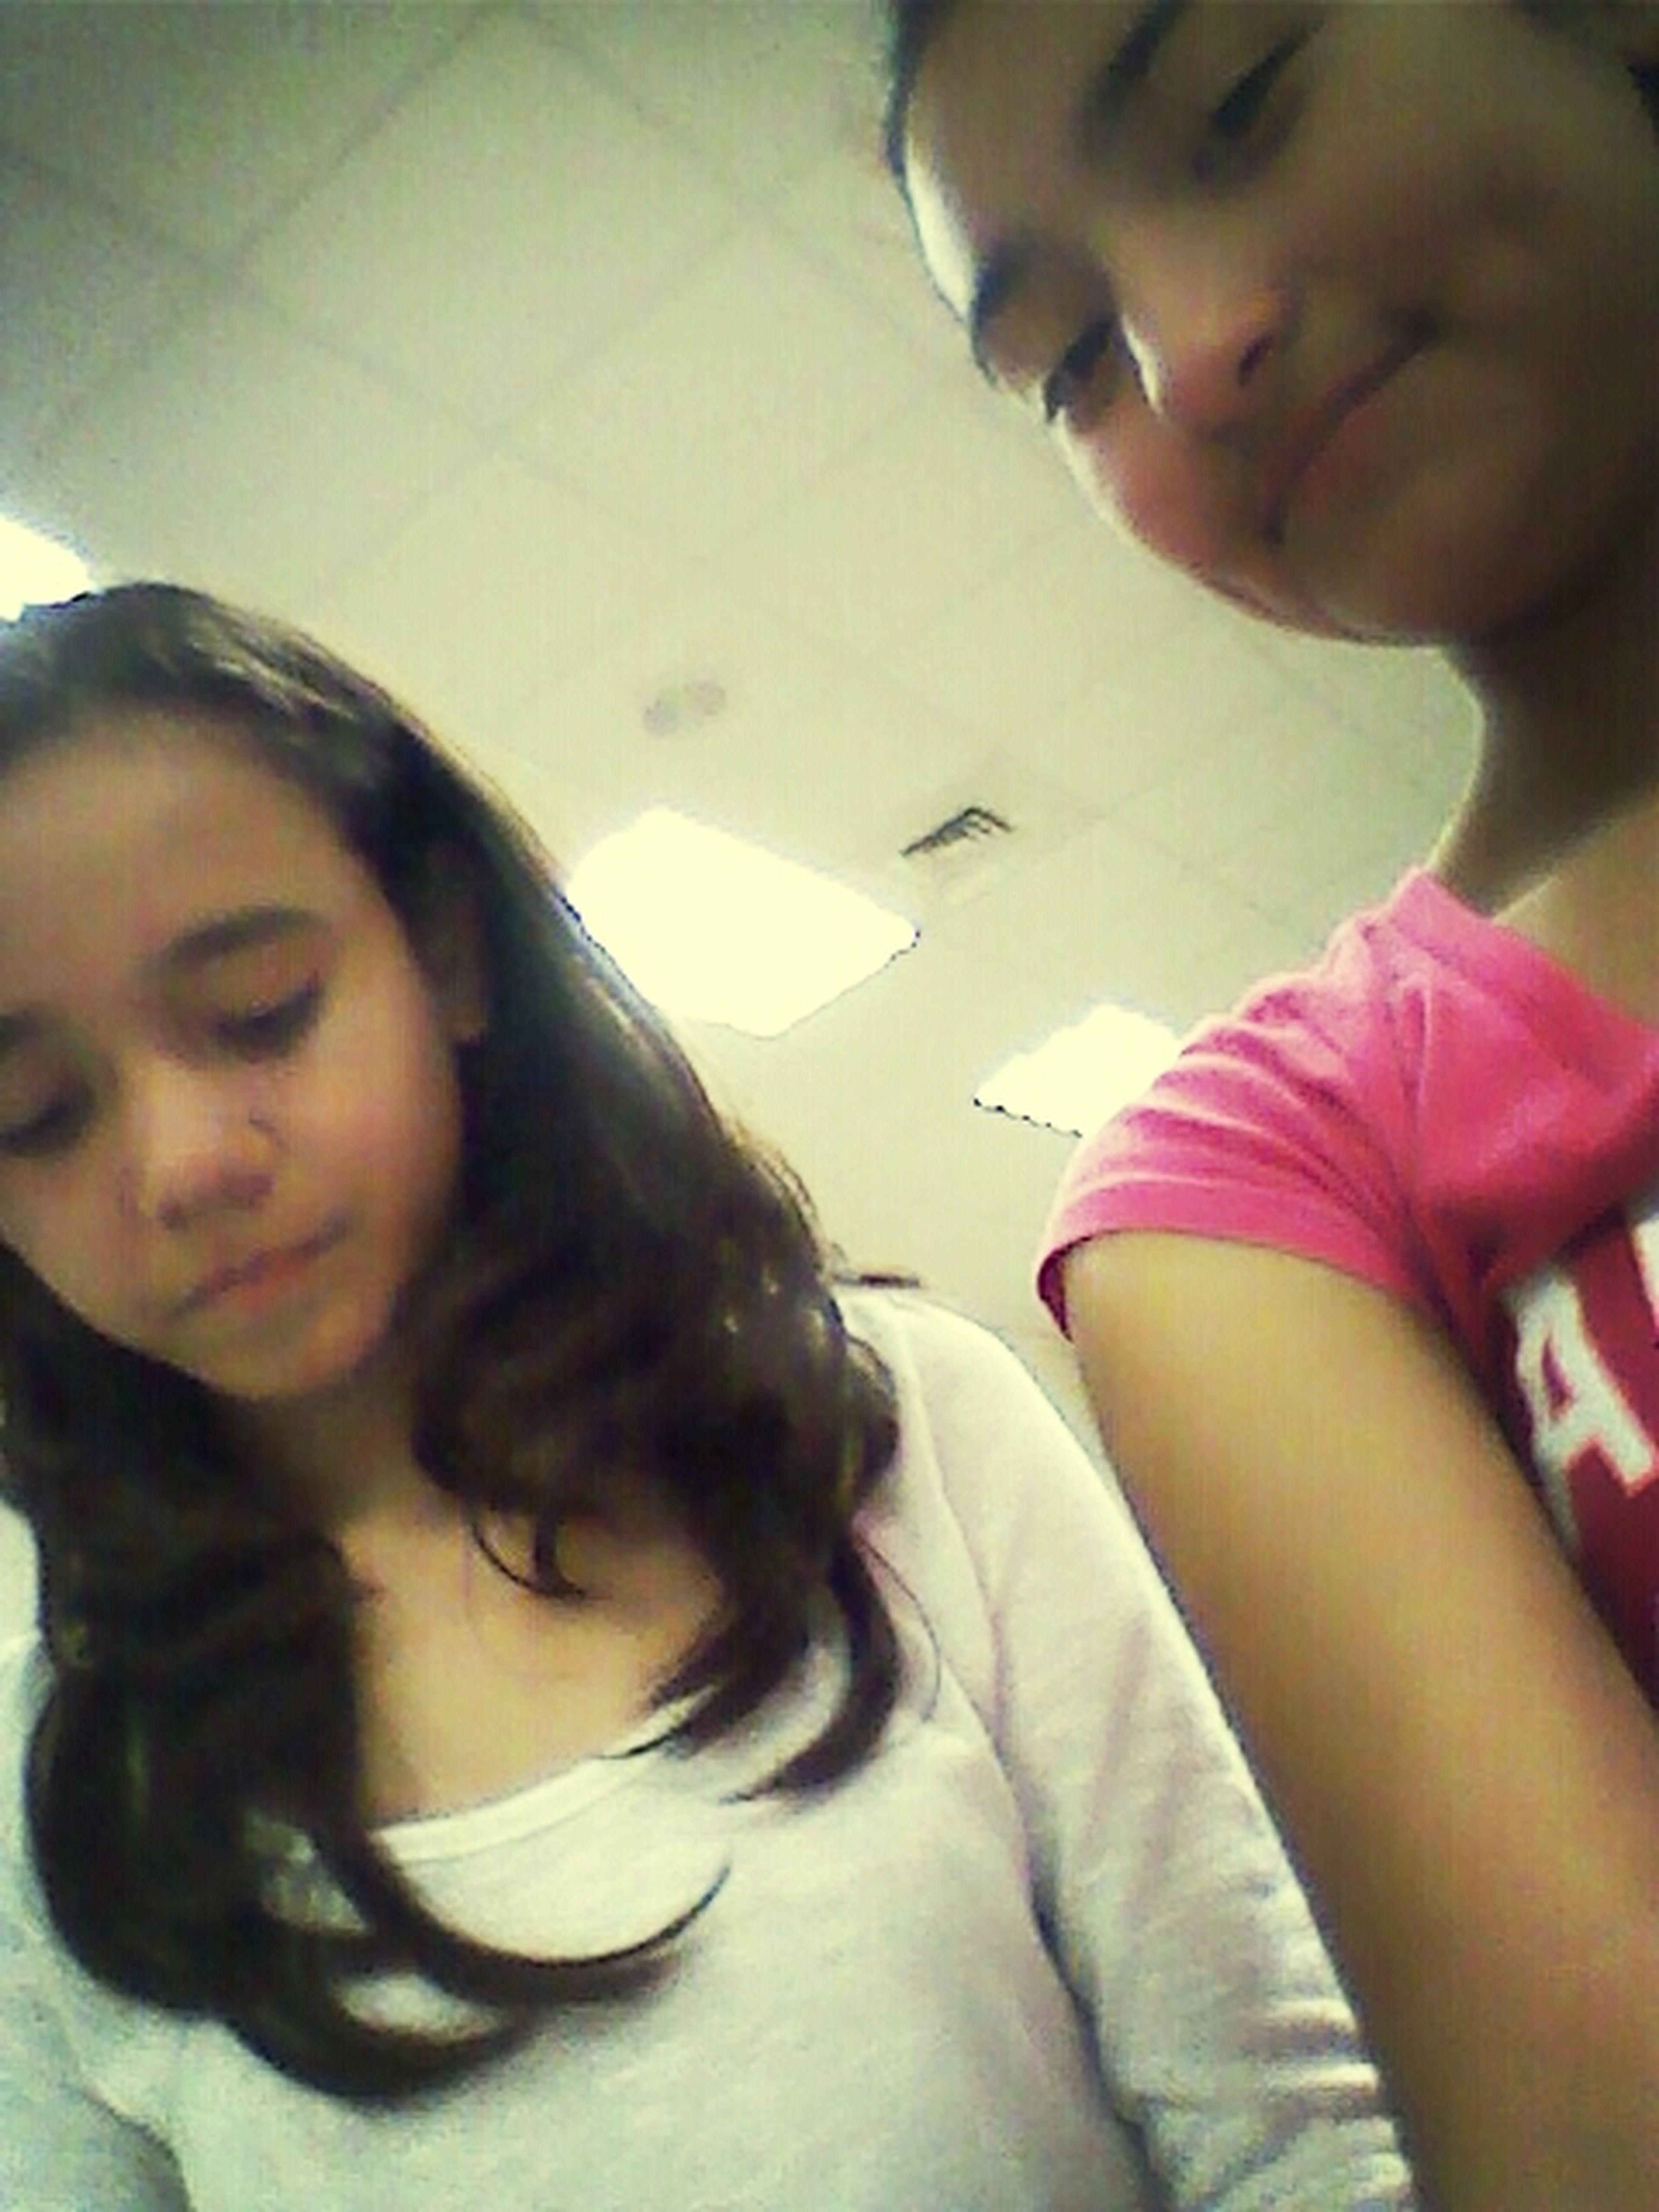 Me And Ashley Bored Af